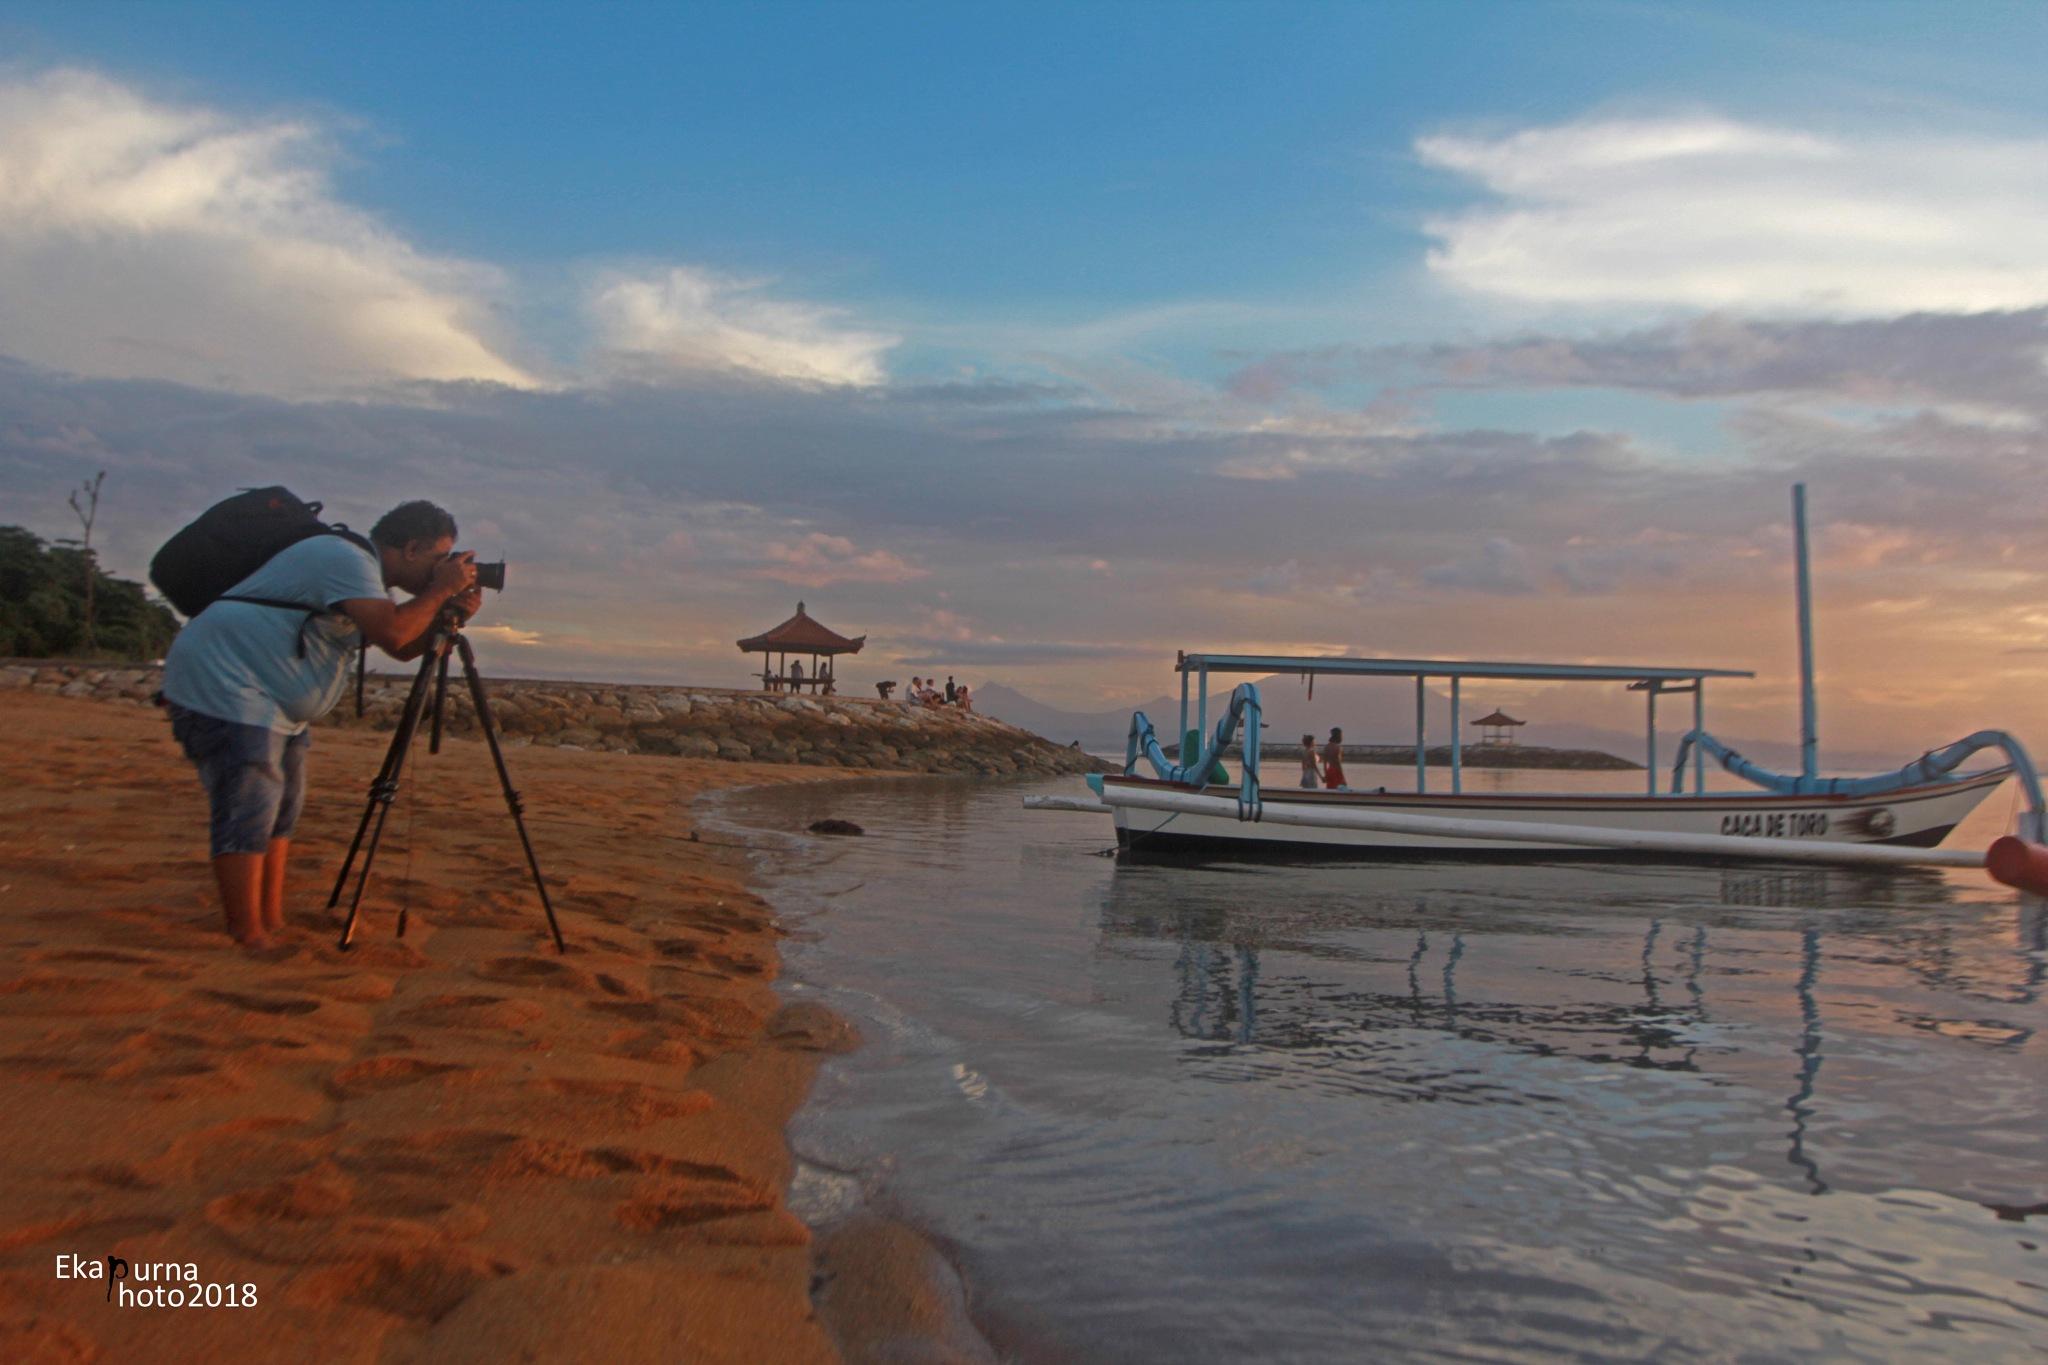 The Photographer by Eka Purna Sumeika